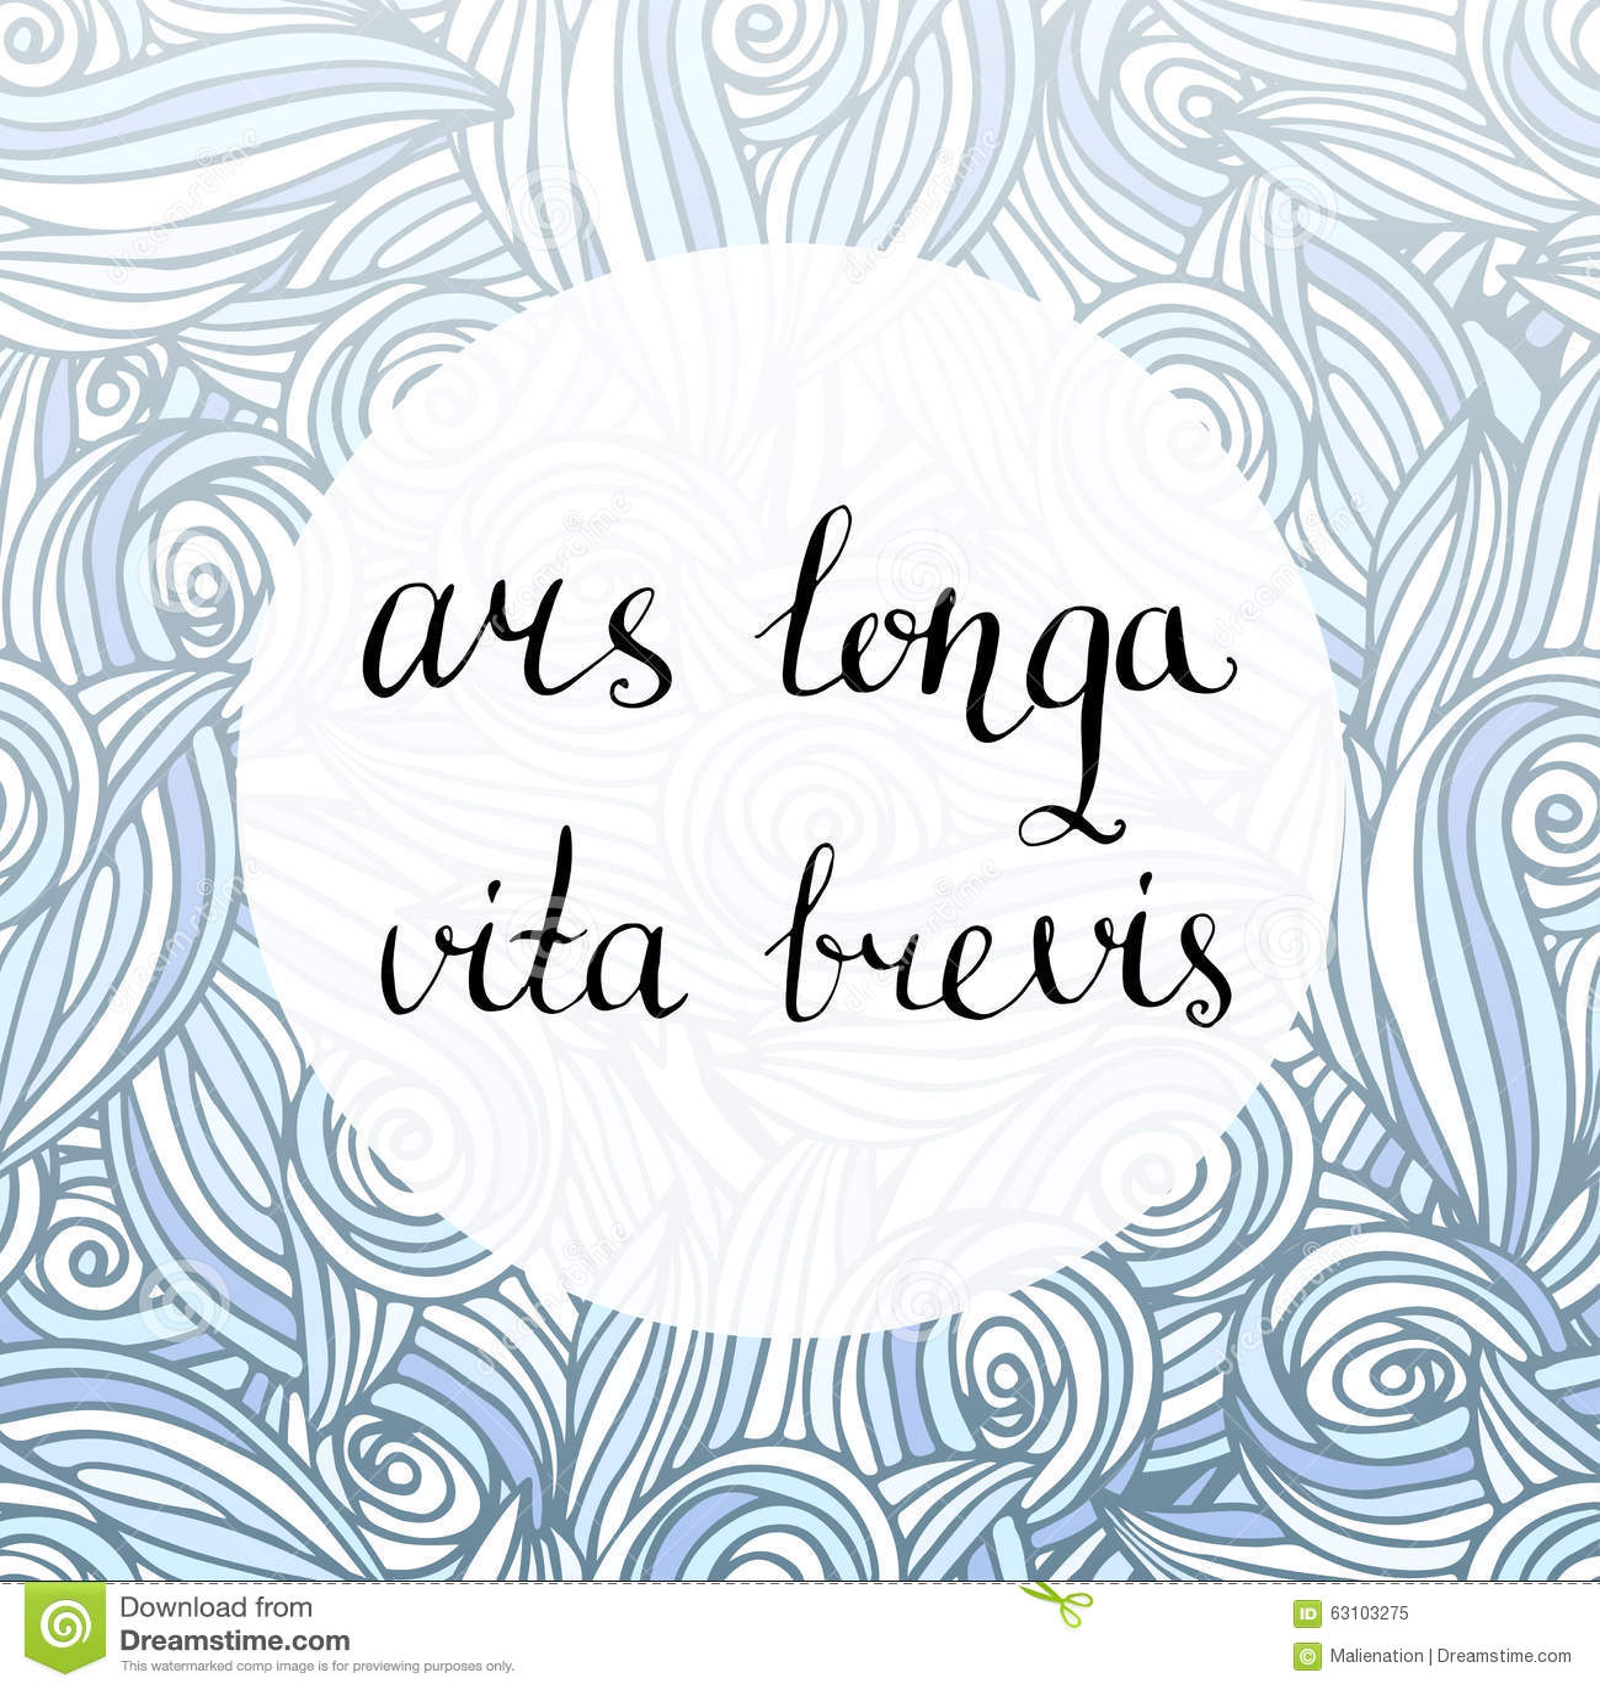 Ars Longa Vita Brevis Latin Phrase Stock Vector Illustration of